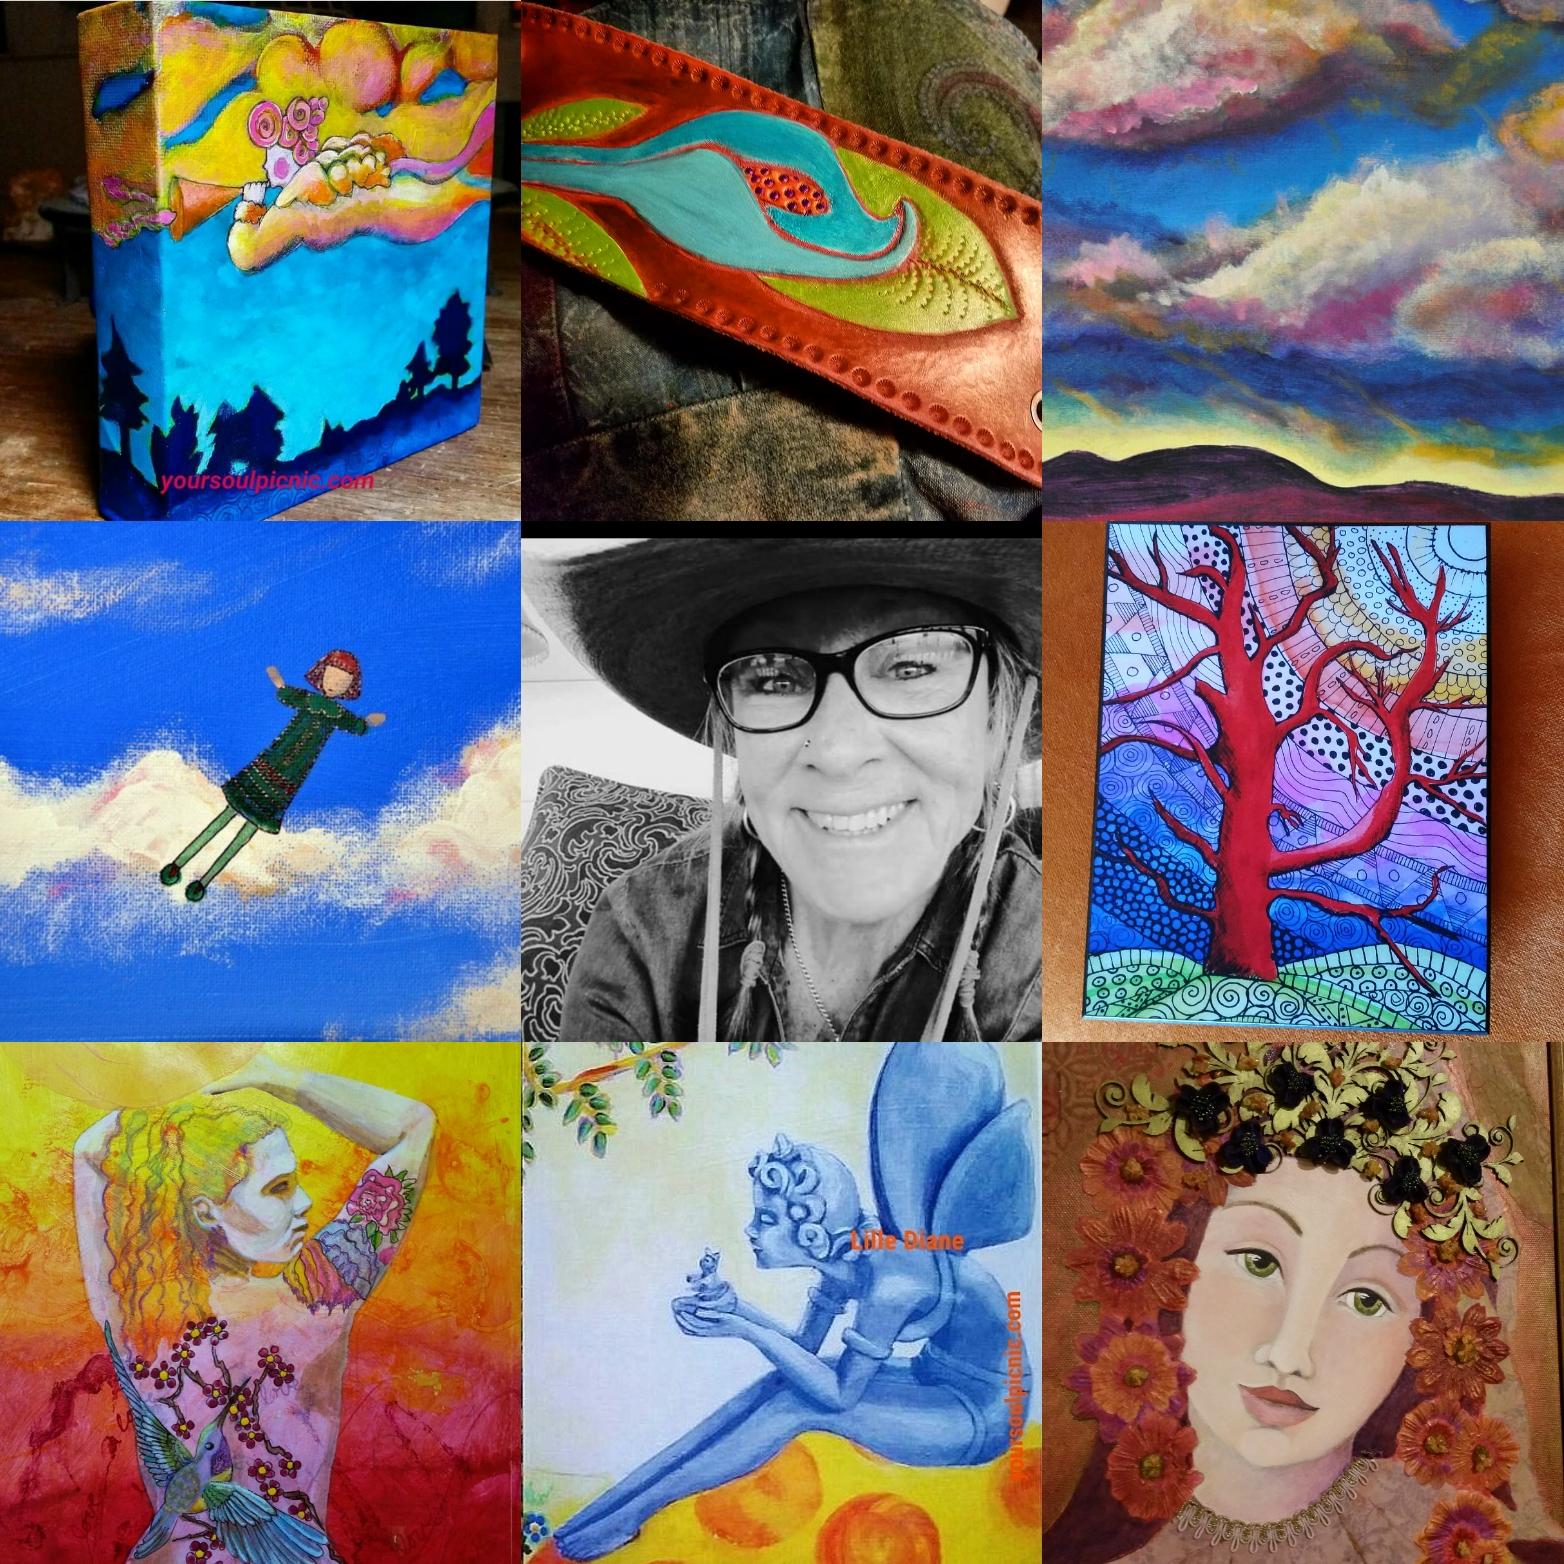 The colorful, joyful world of Lille Diane